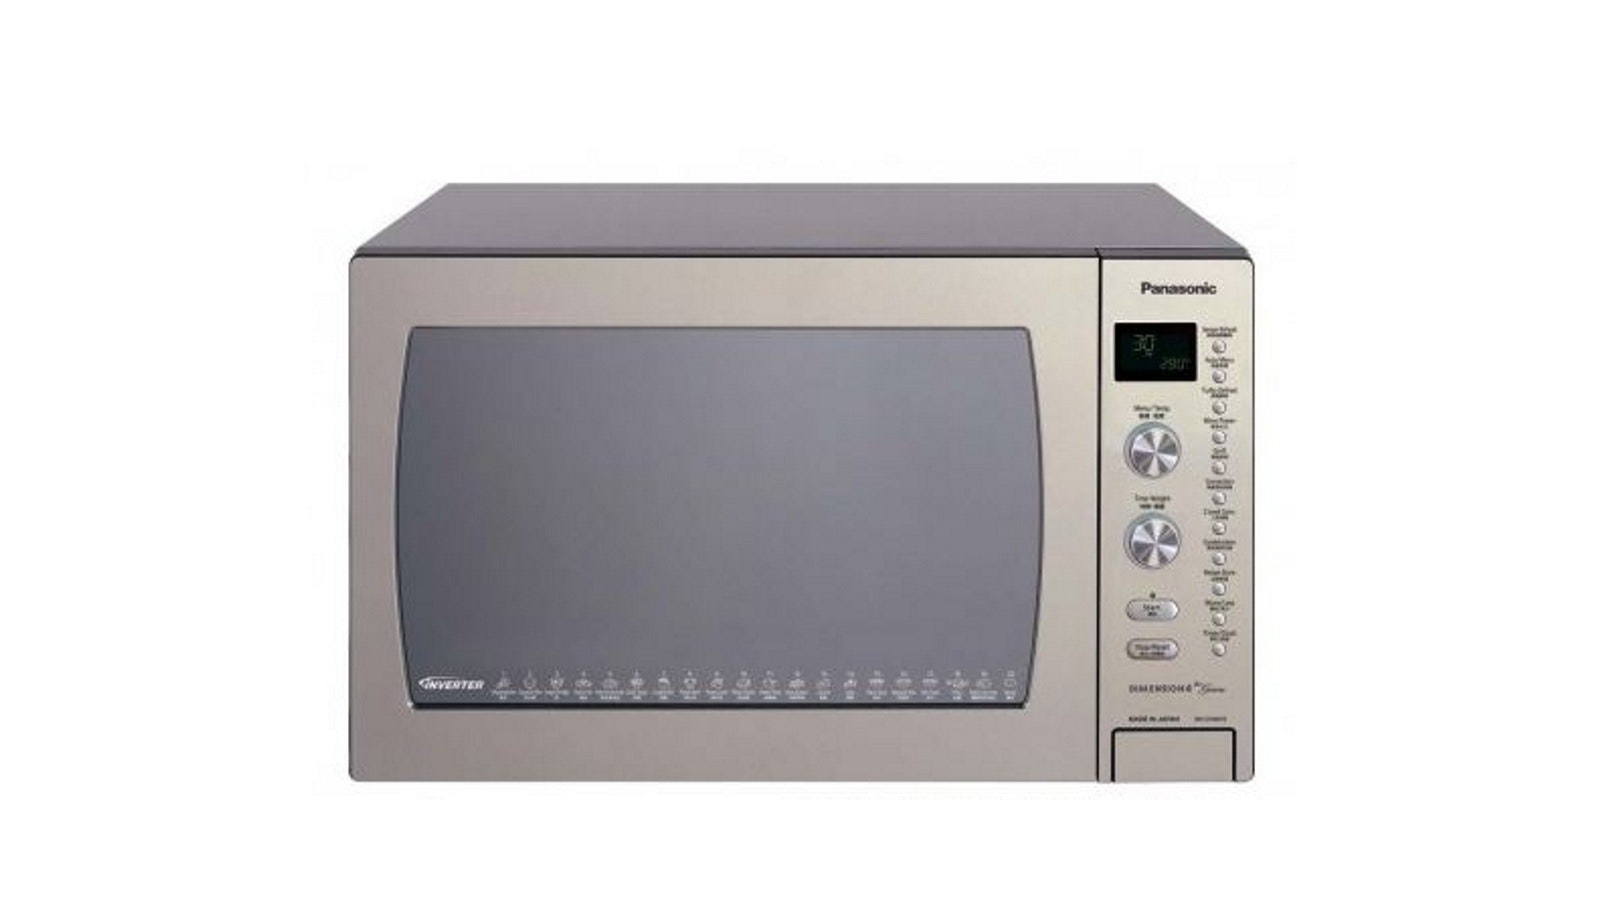 Panasonic Nn Cd997sypq Microwave Oven Harvey Norman